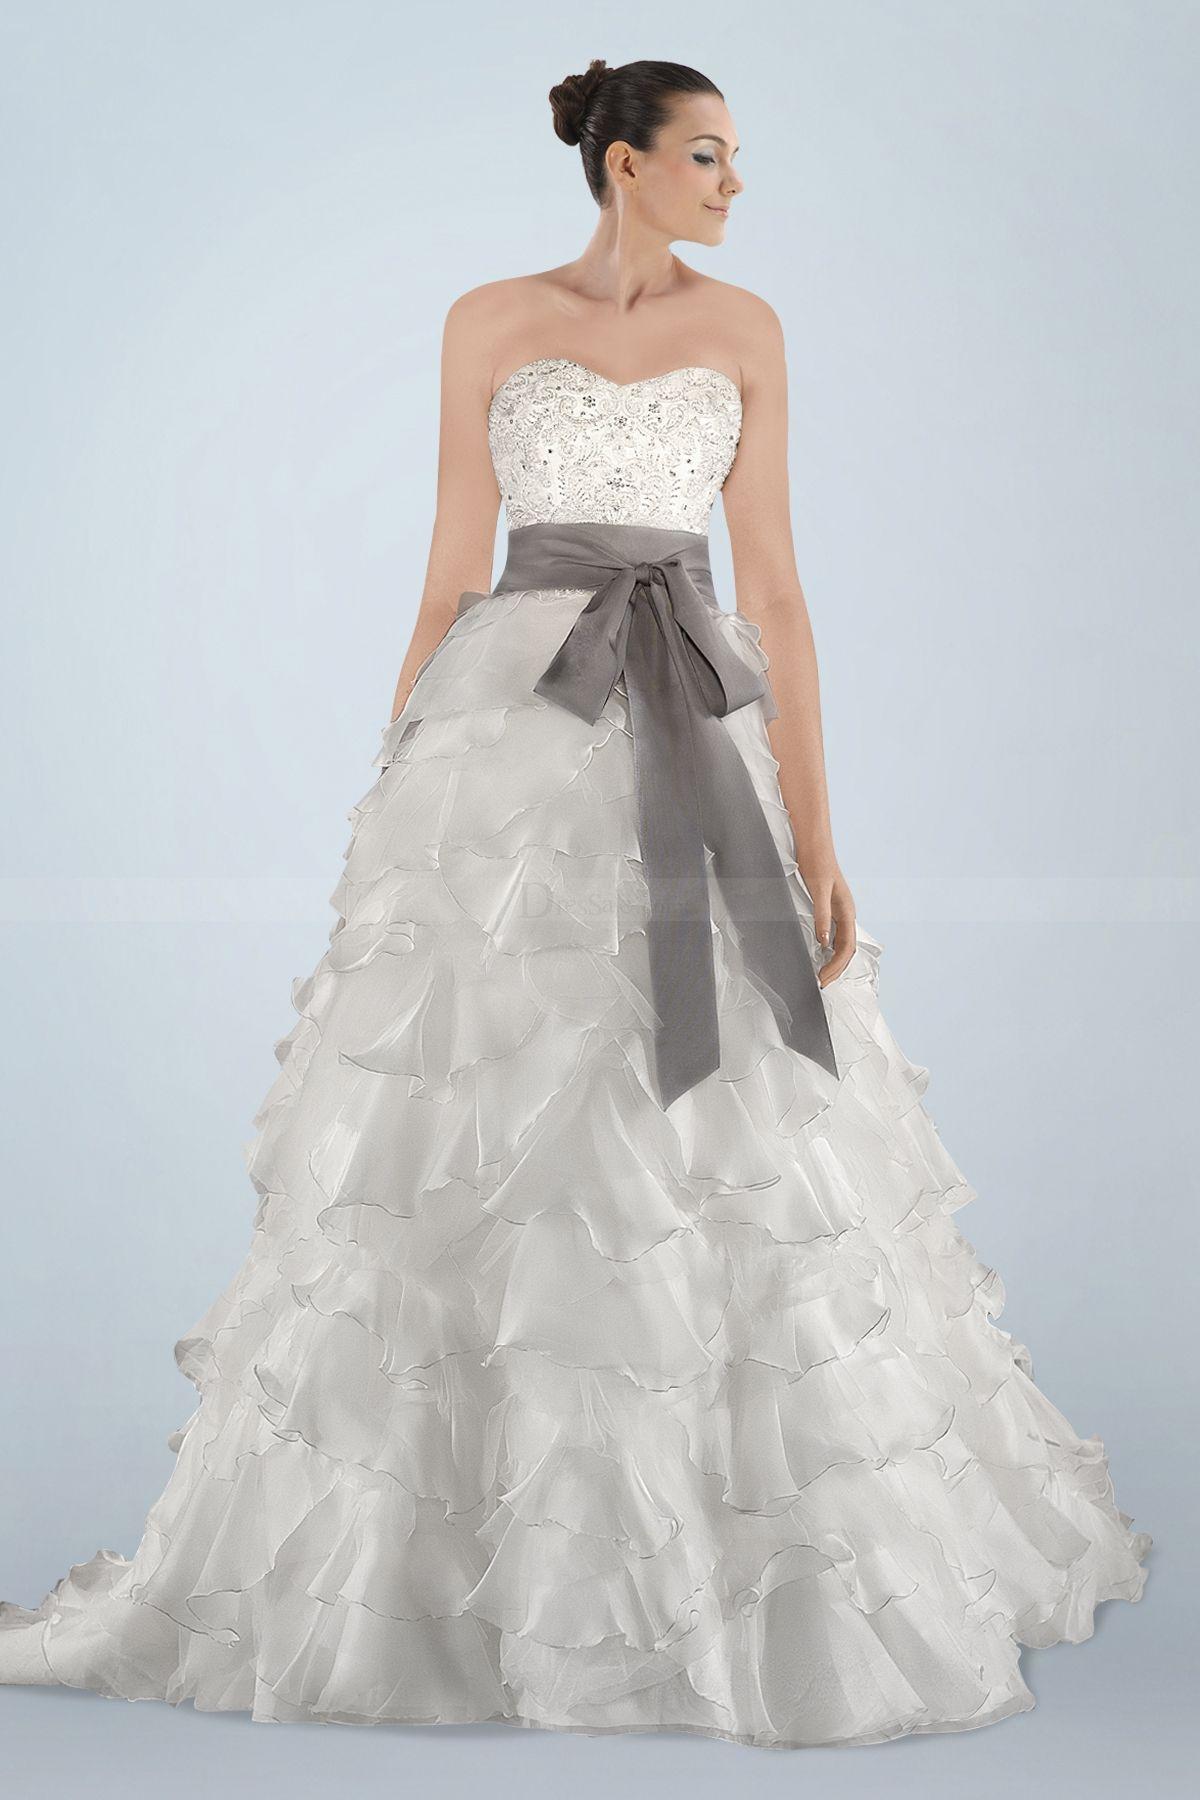 34+ Tiered wedding dress usa info